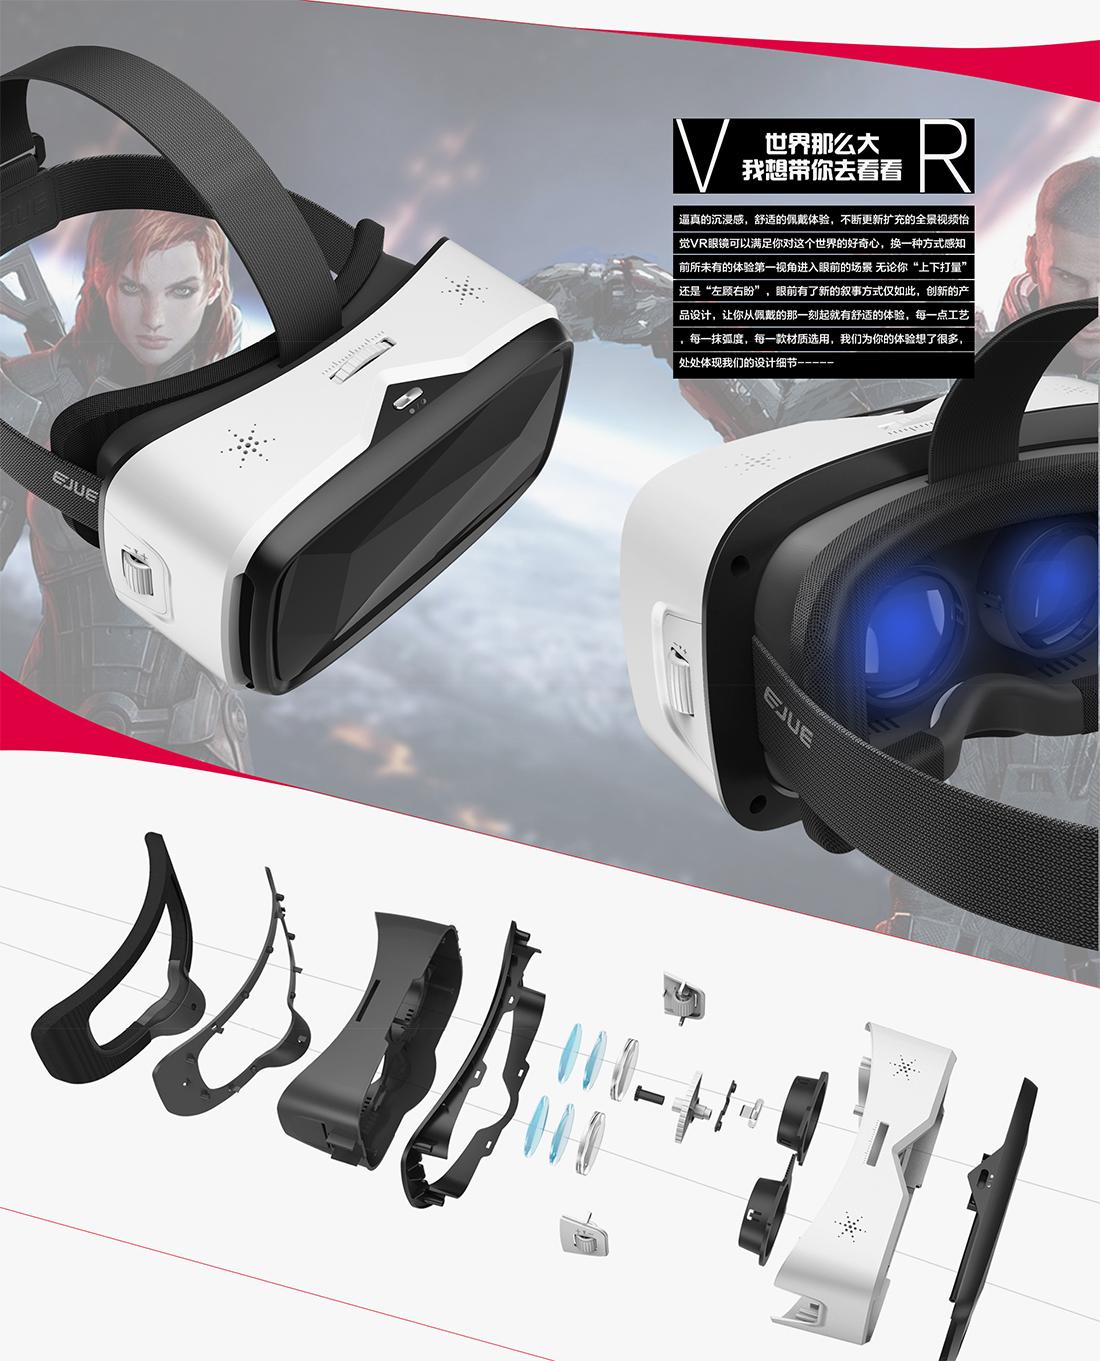 VR智能眼鏡.jpg